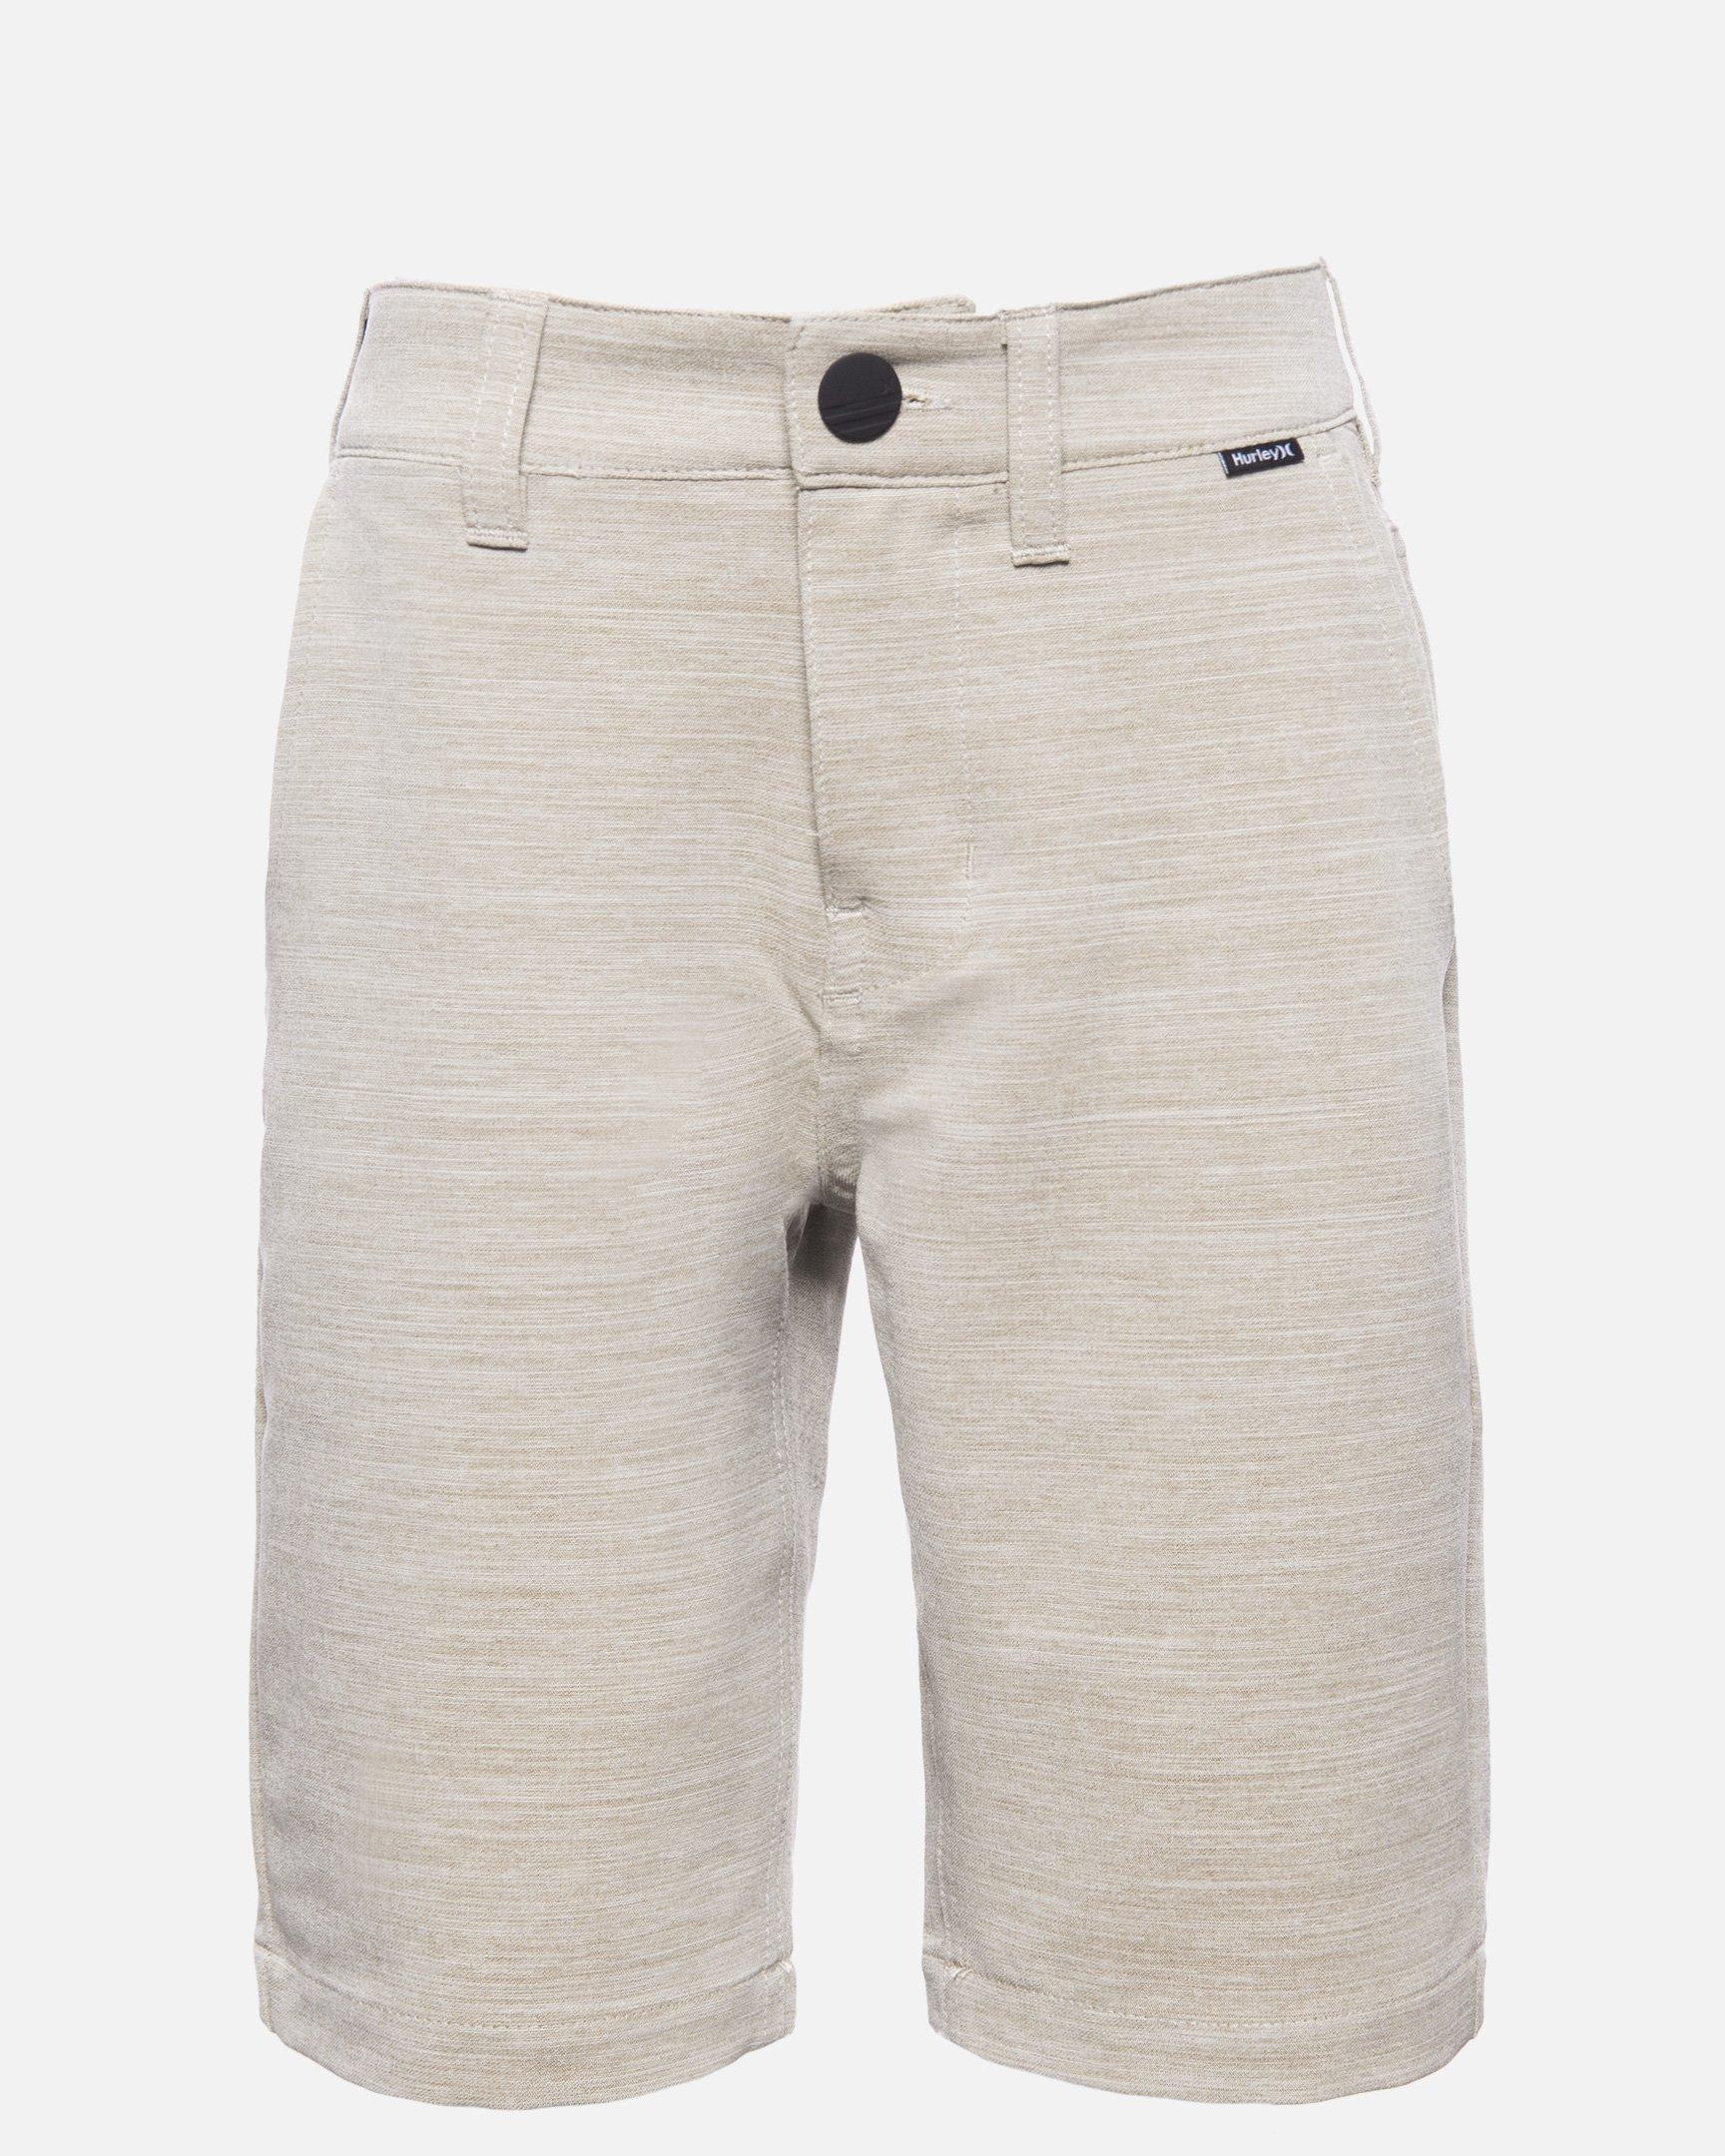 Boys' Dri-Fit Cutback Walkshort in Khaki, Size 8